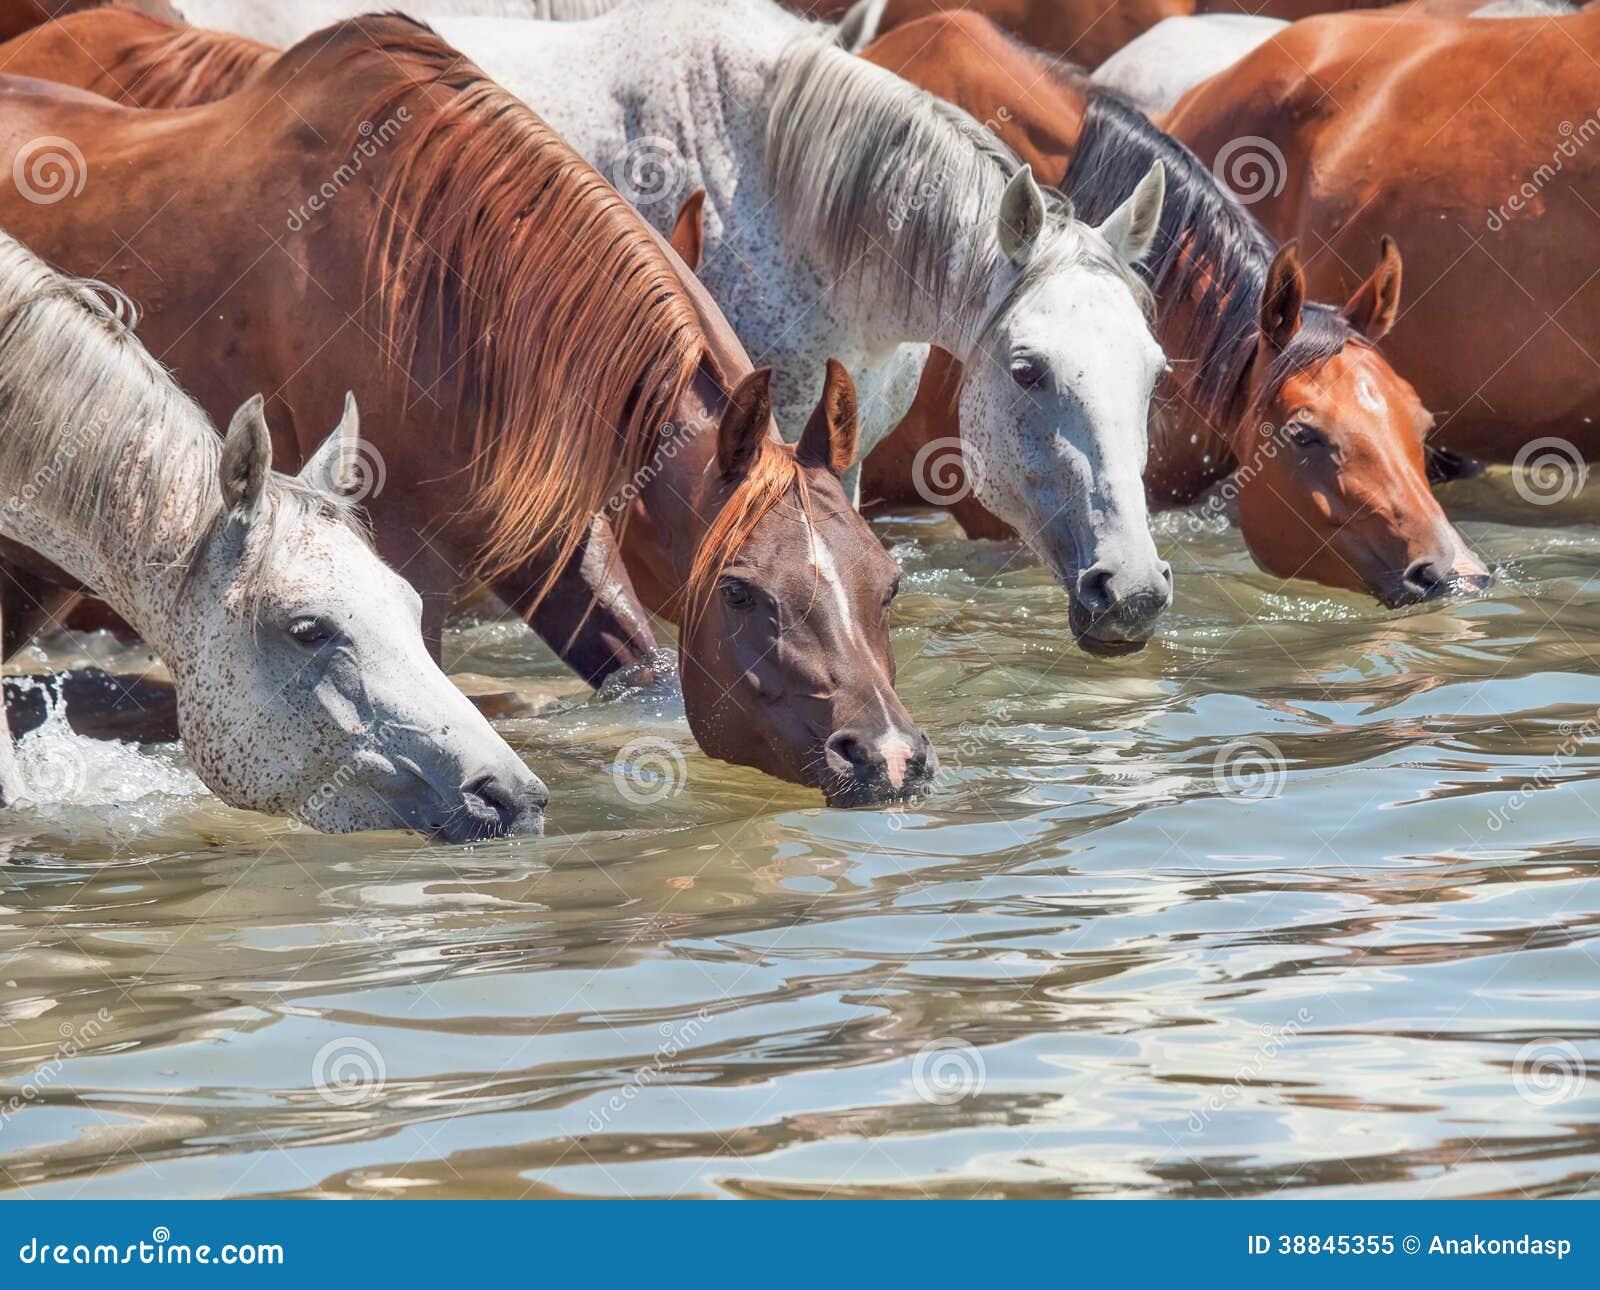 Drinking Arabian Horse In The Lake Stock Photo Image